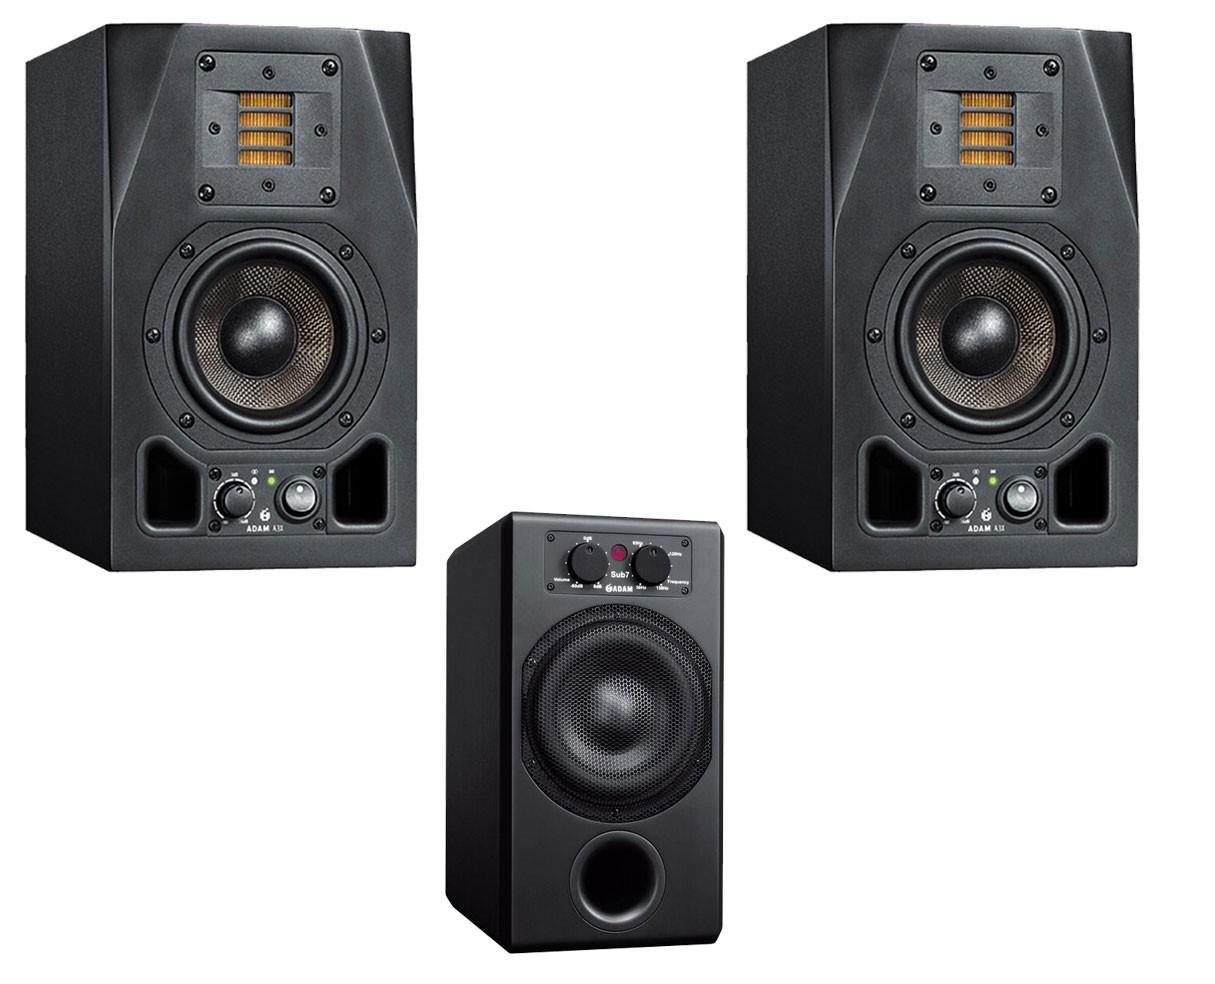 2x ADAM A3X + Sub7 2.1 System